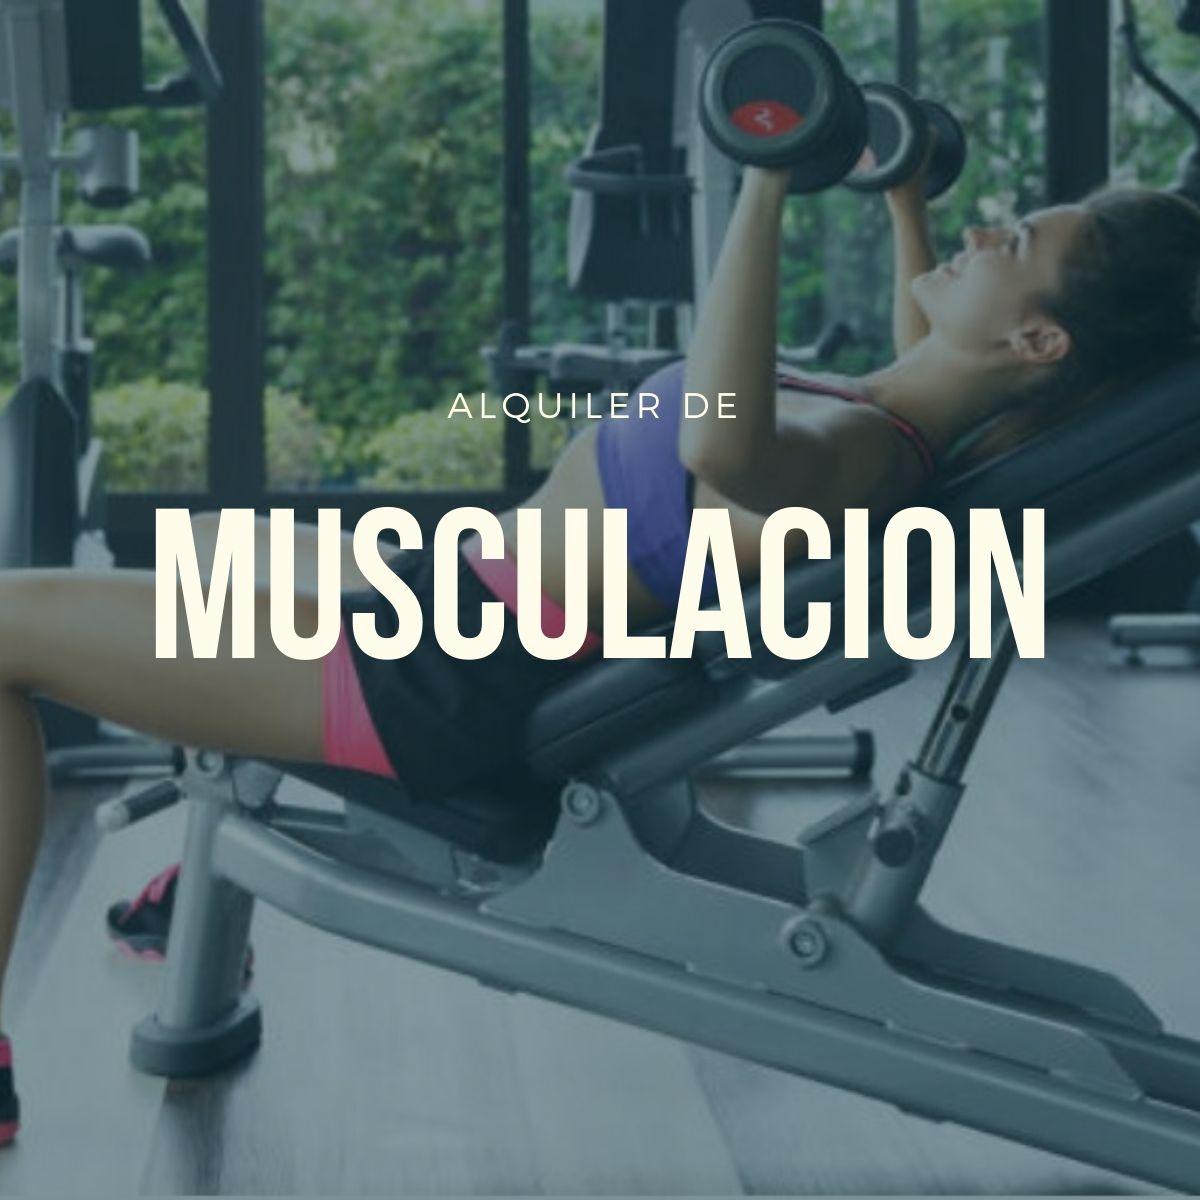 alquiler musculacion